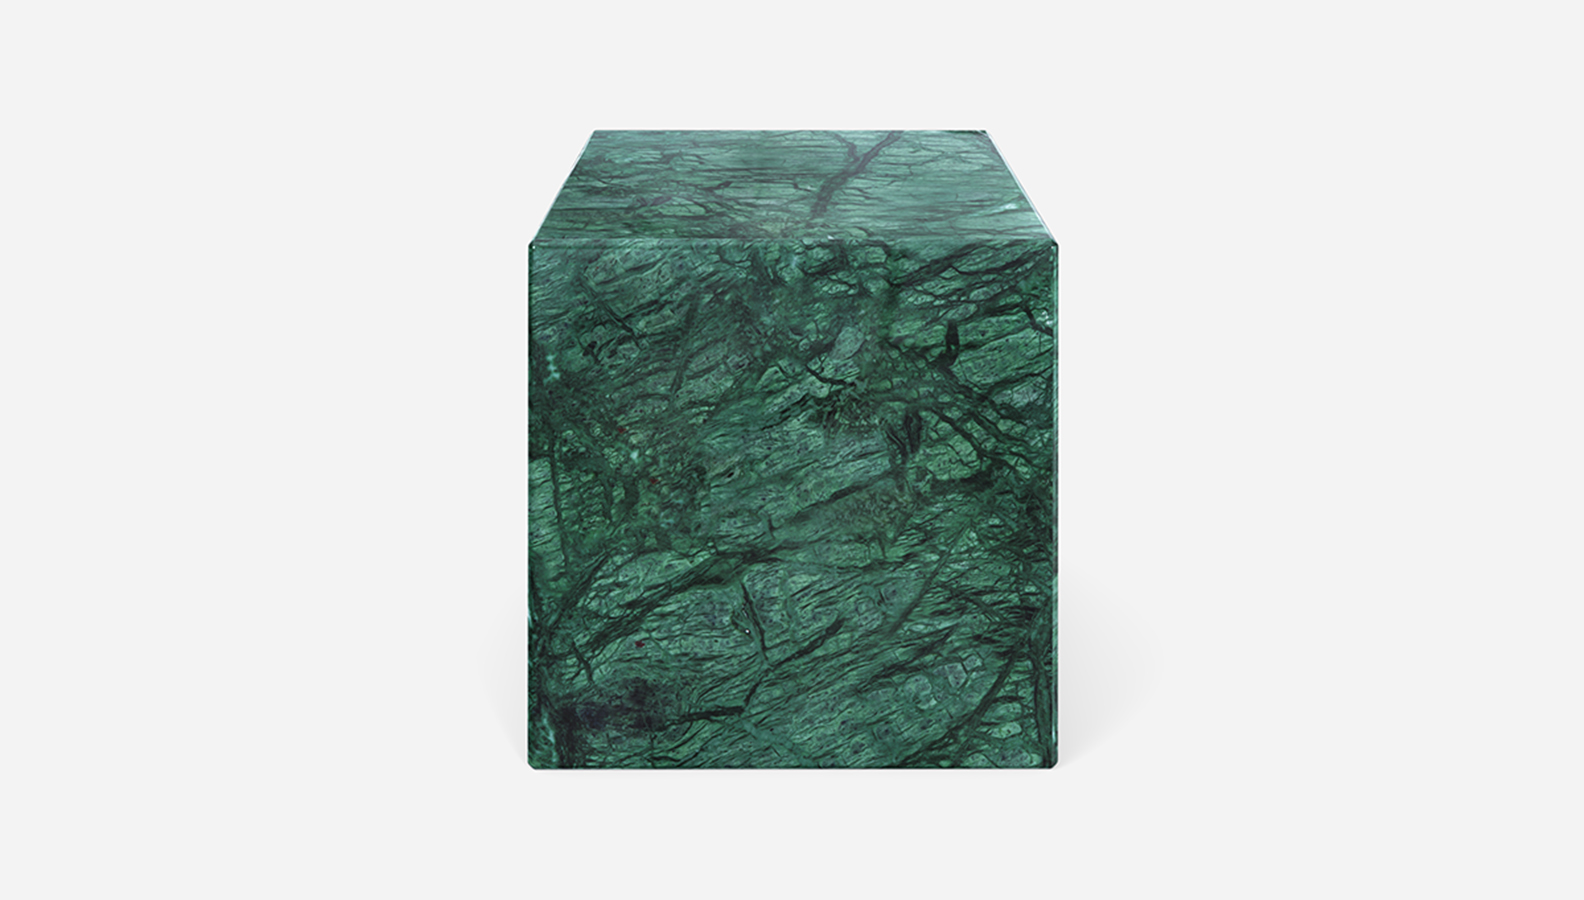 Aime Té Marmerblok Kubus - India Green - 40  x 40  x 40